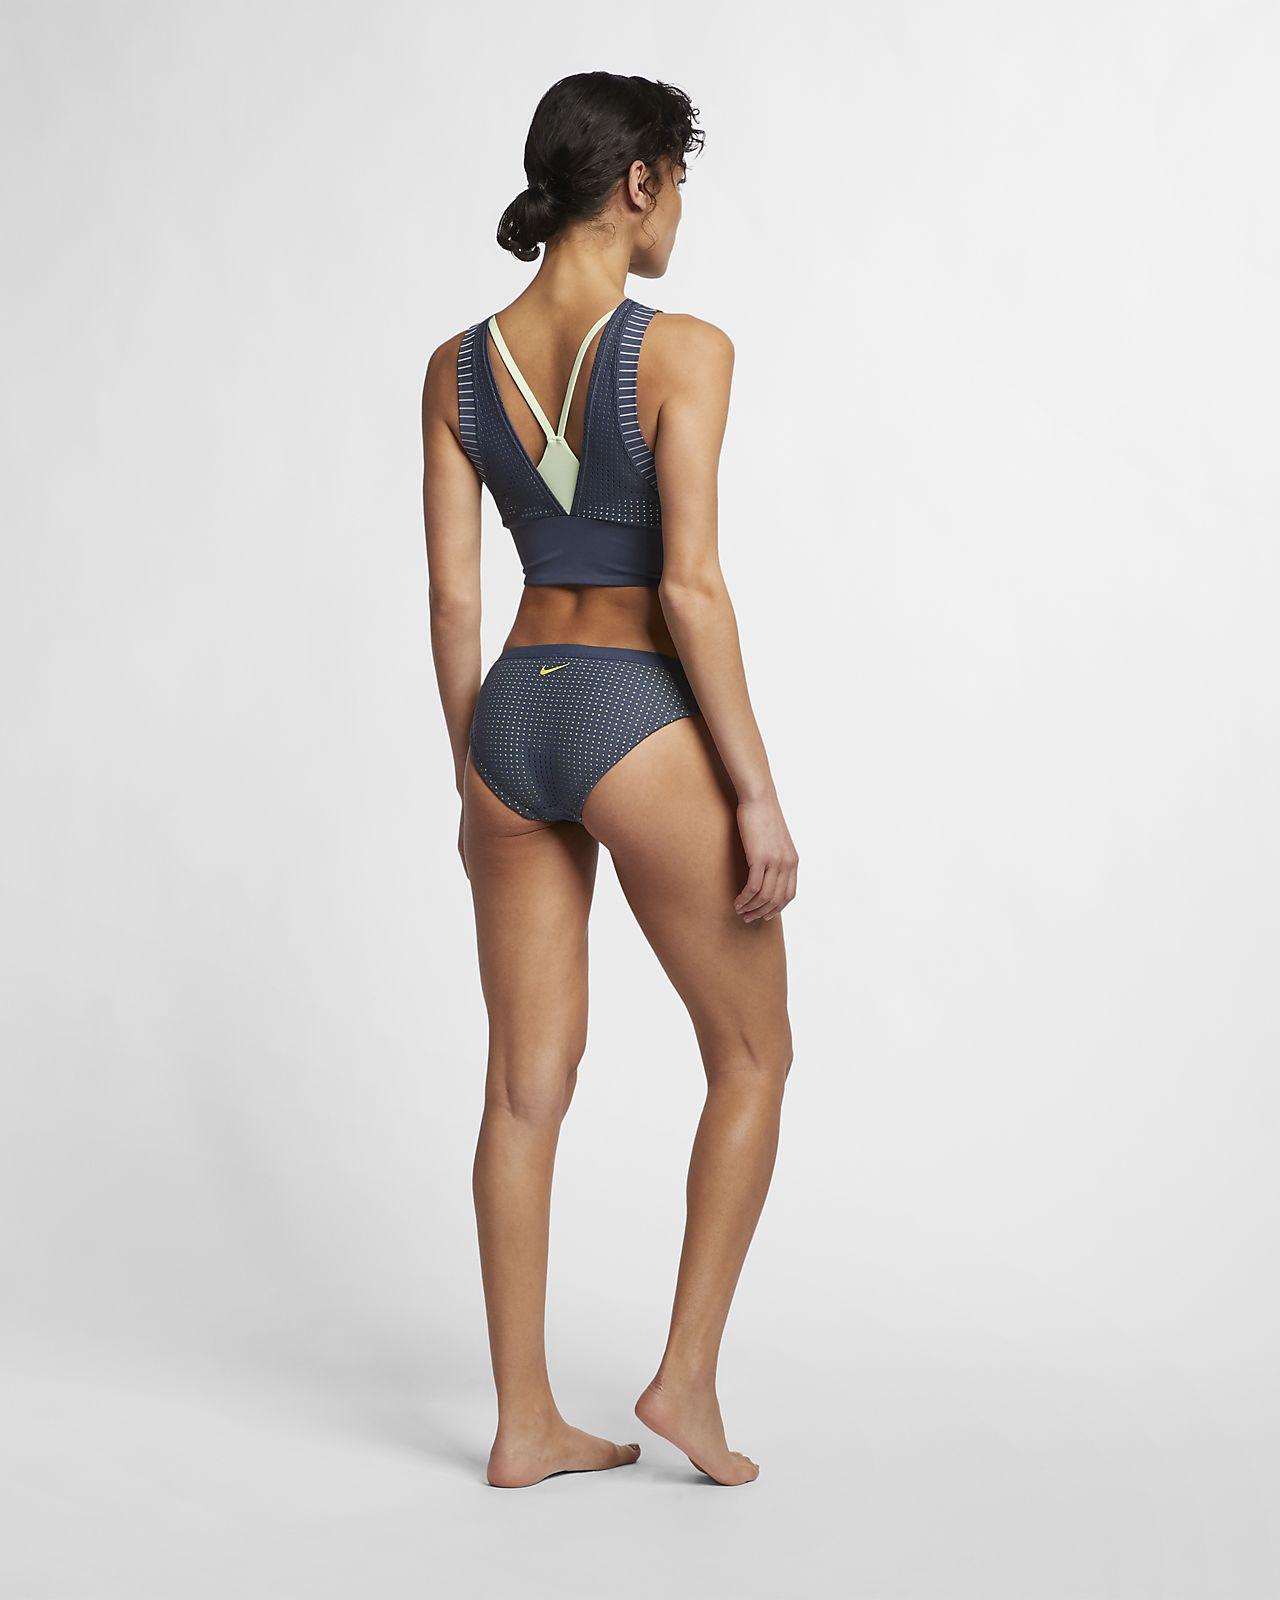 68d466c1d6ec7 Nike Sport Midkini Women s Layered Mesh Swim Top. Nike.com